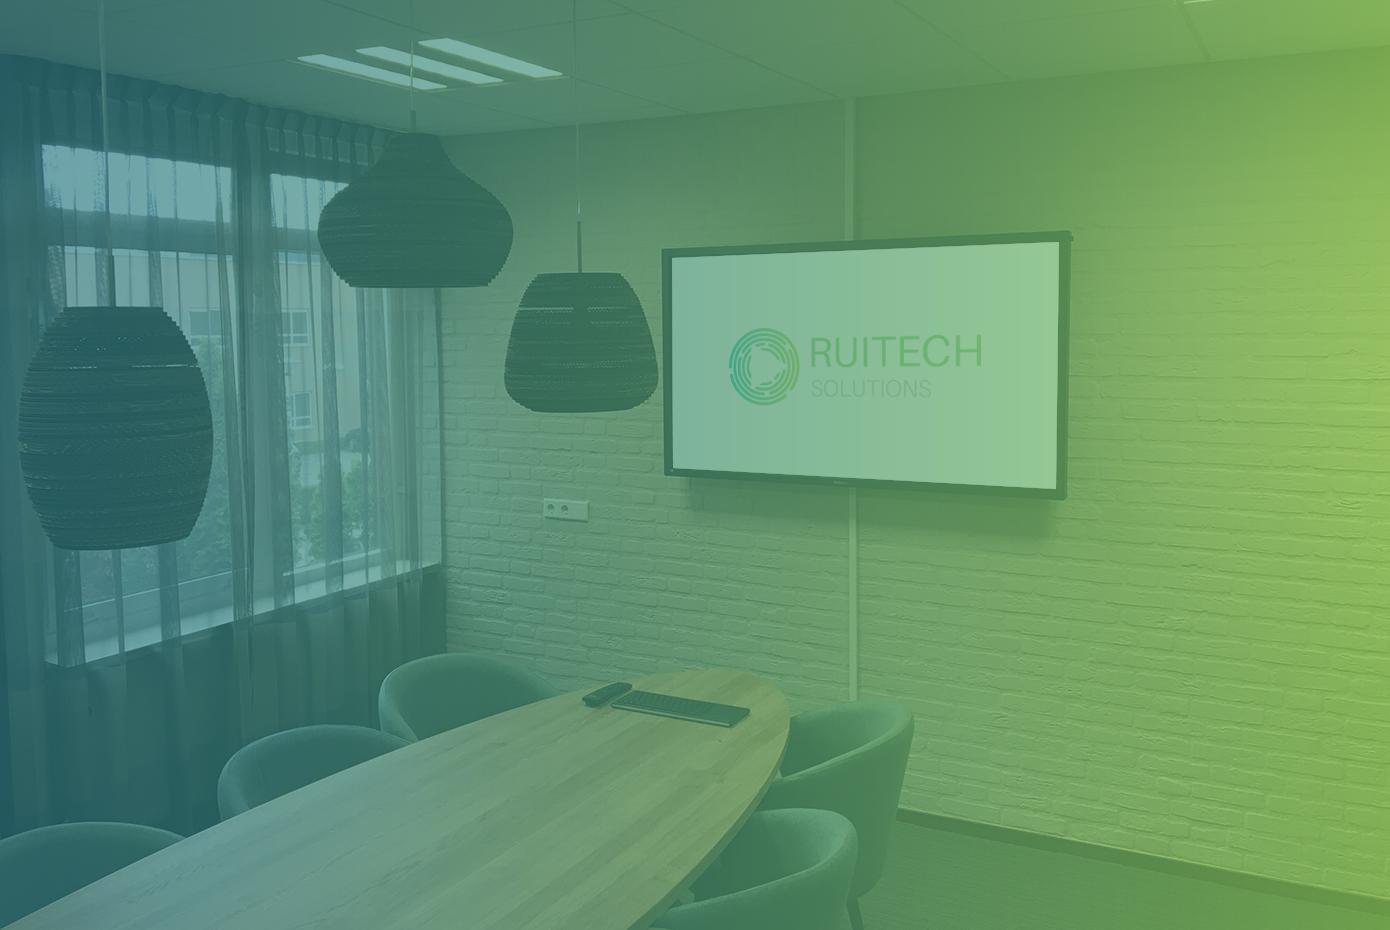 Ruitech-slider-2